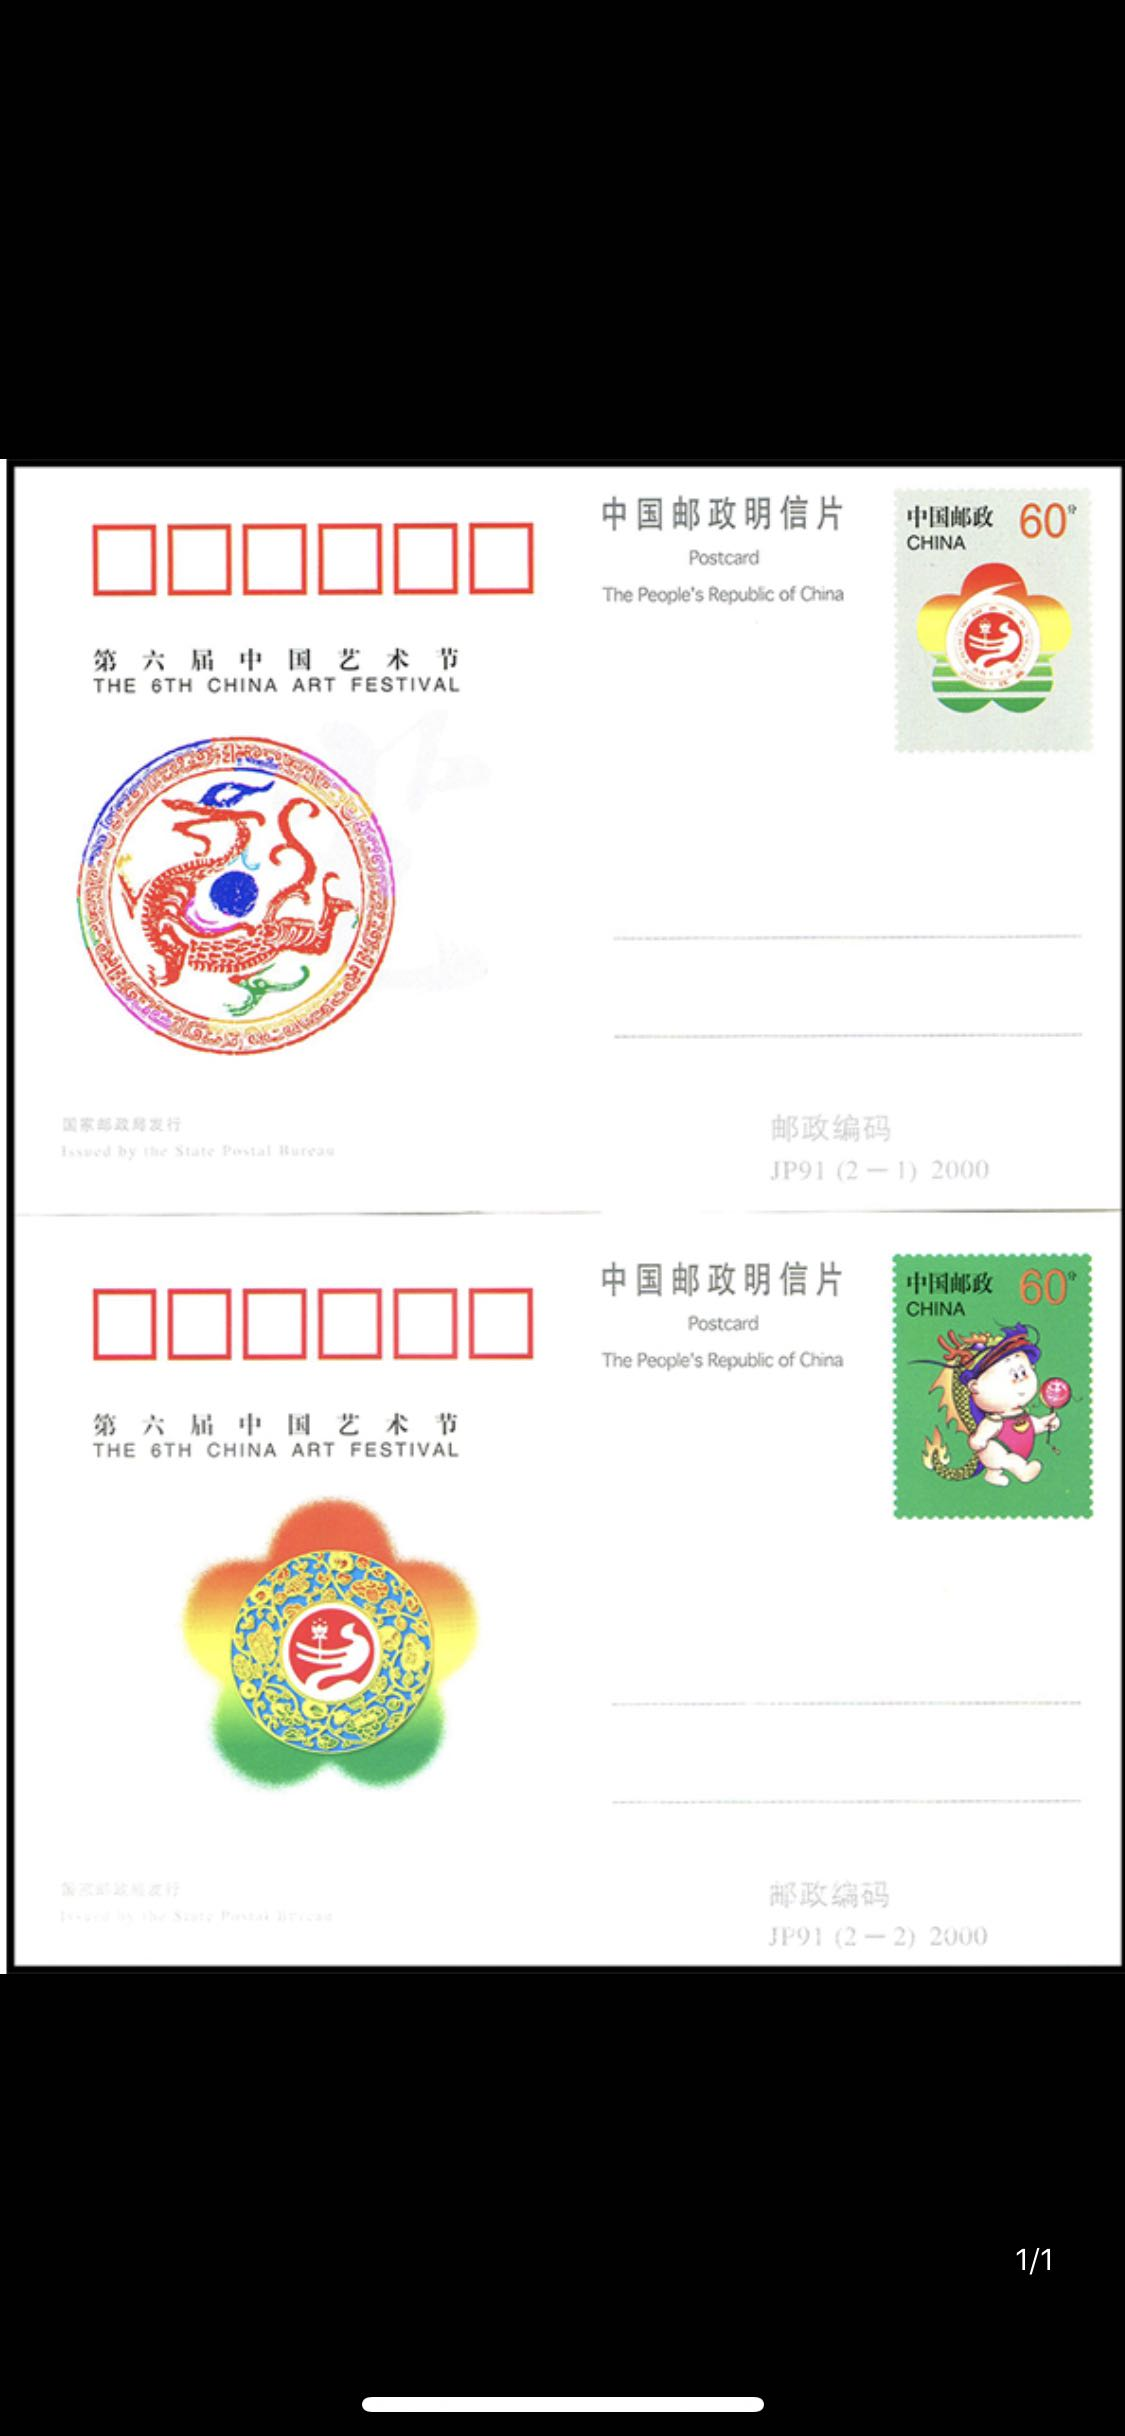 JP91 2000年 第六届中国艺术节 纪念邮资明信片 邮资片 全套2枚G Изображение 1